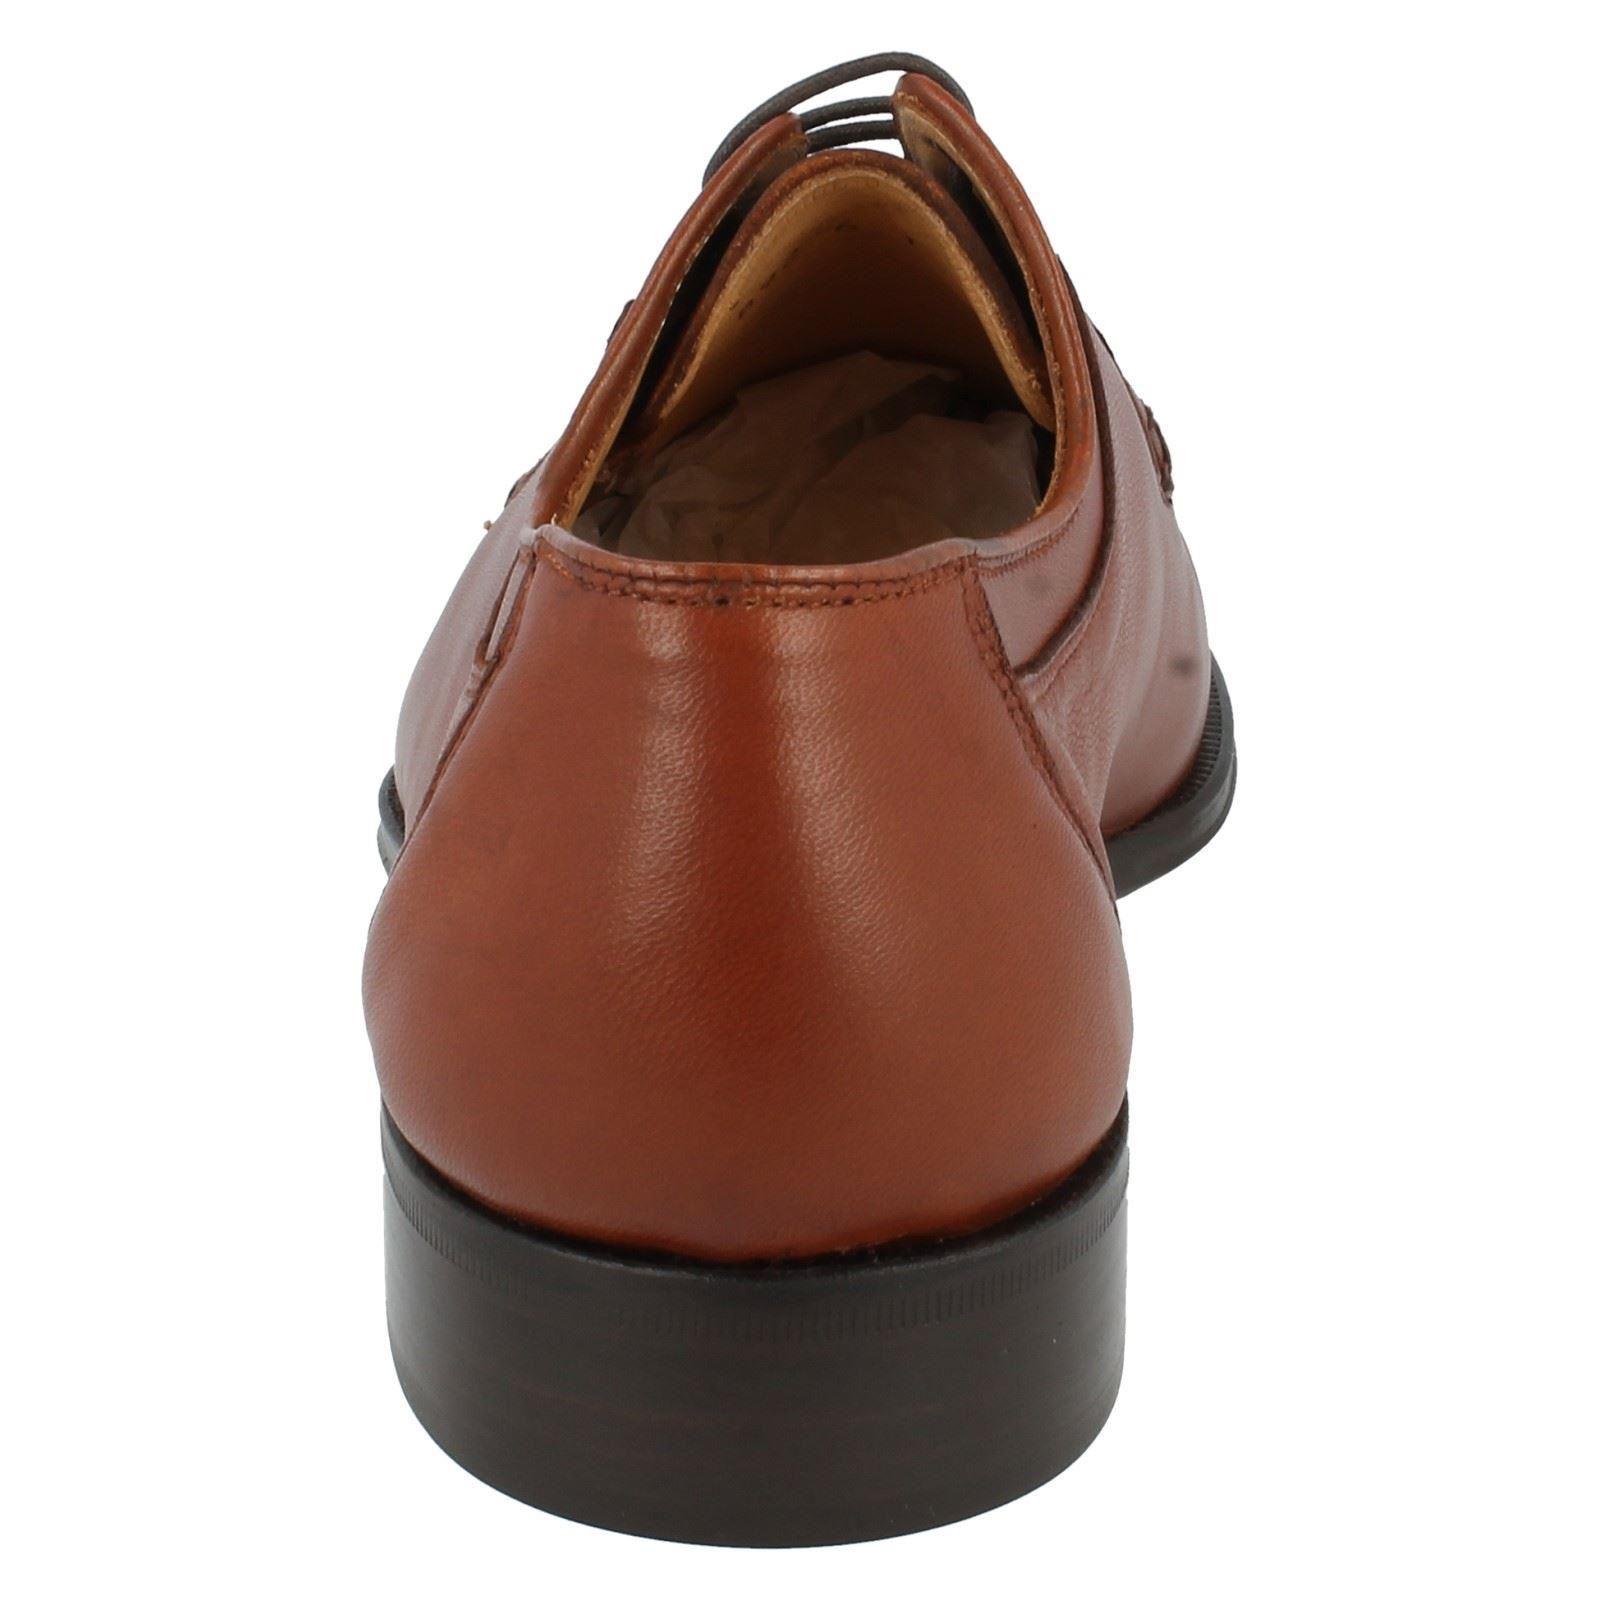 Herren Grenson True Moccasin Schuhes Evan Style 9646 e80398